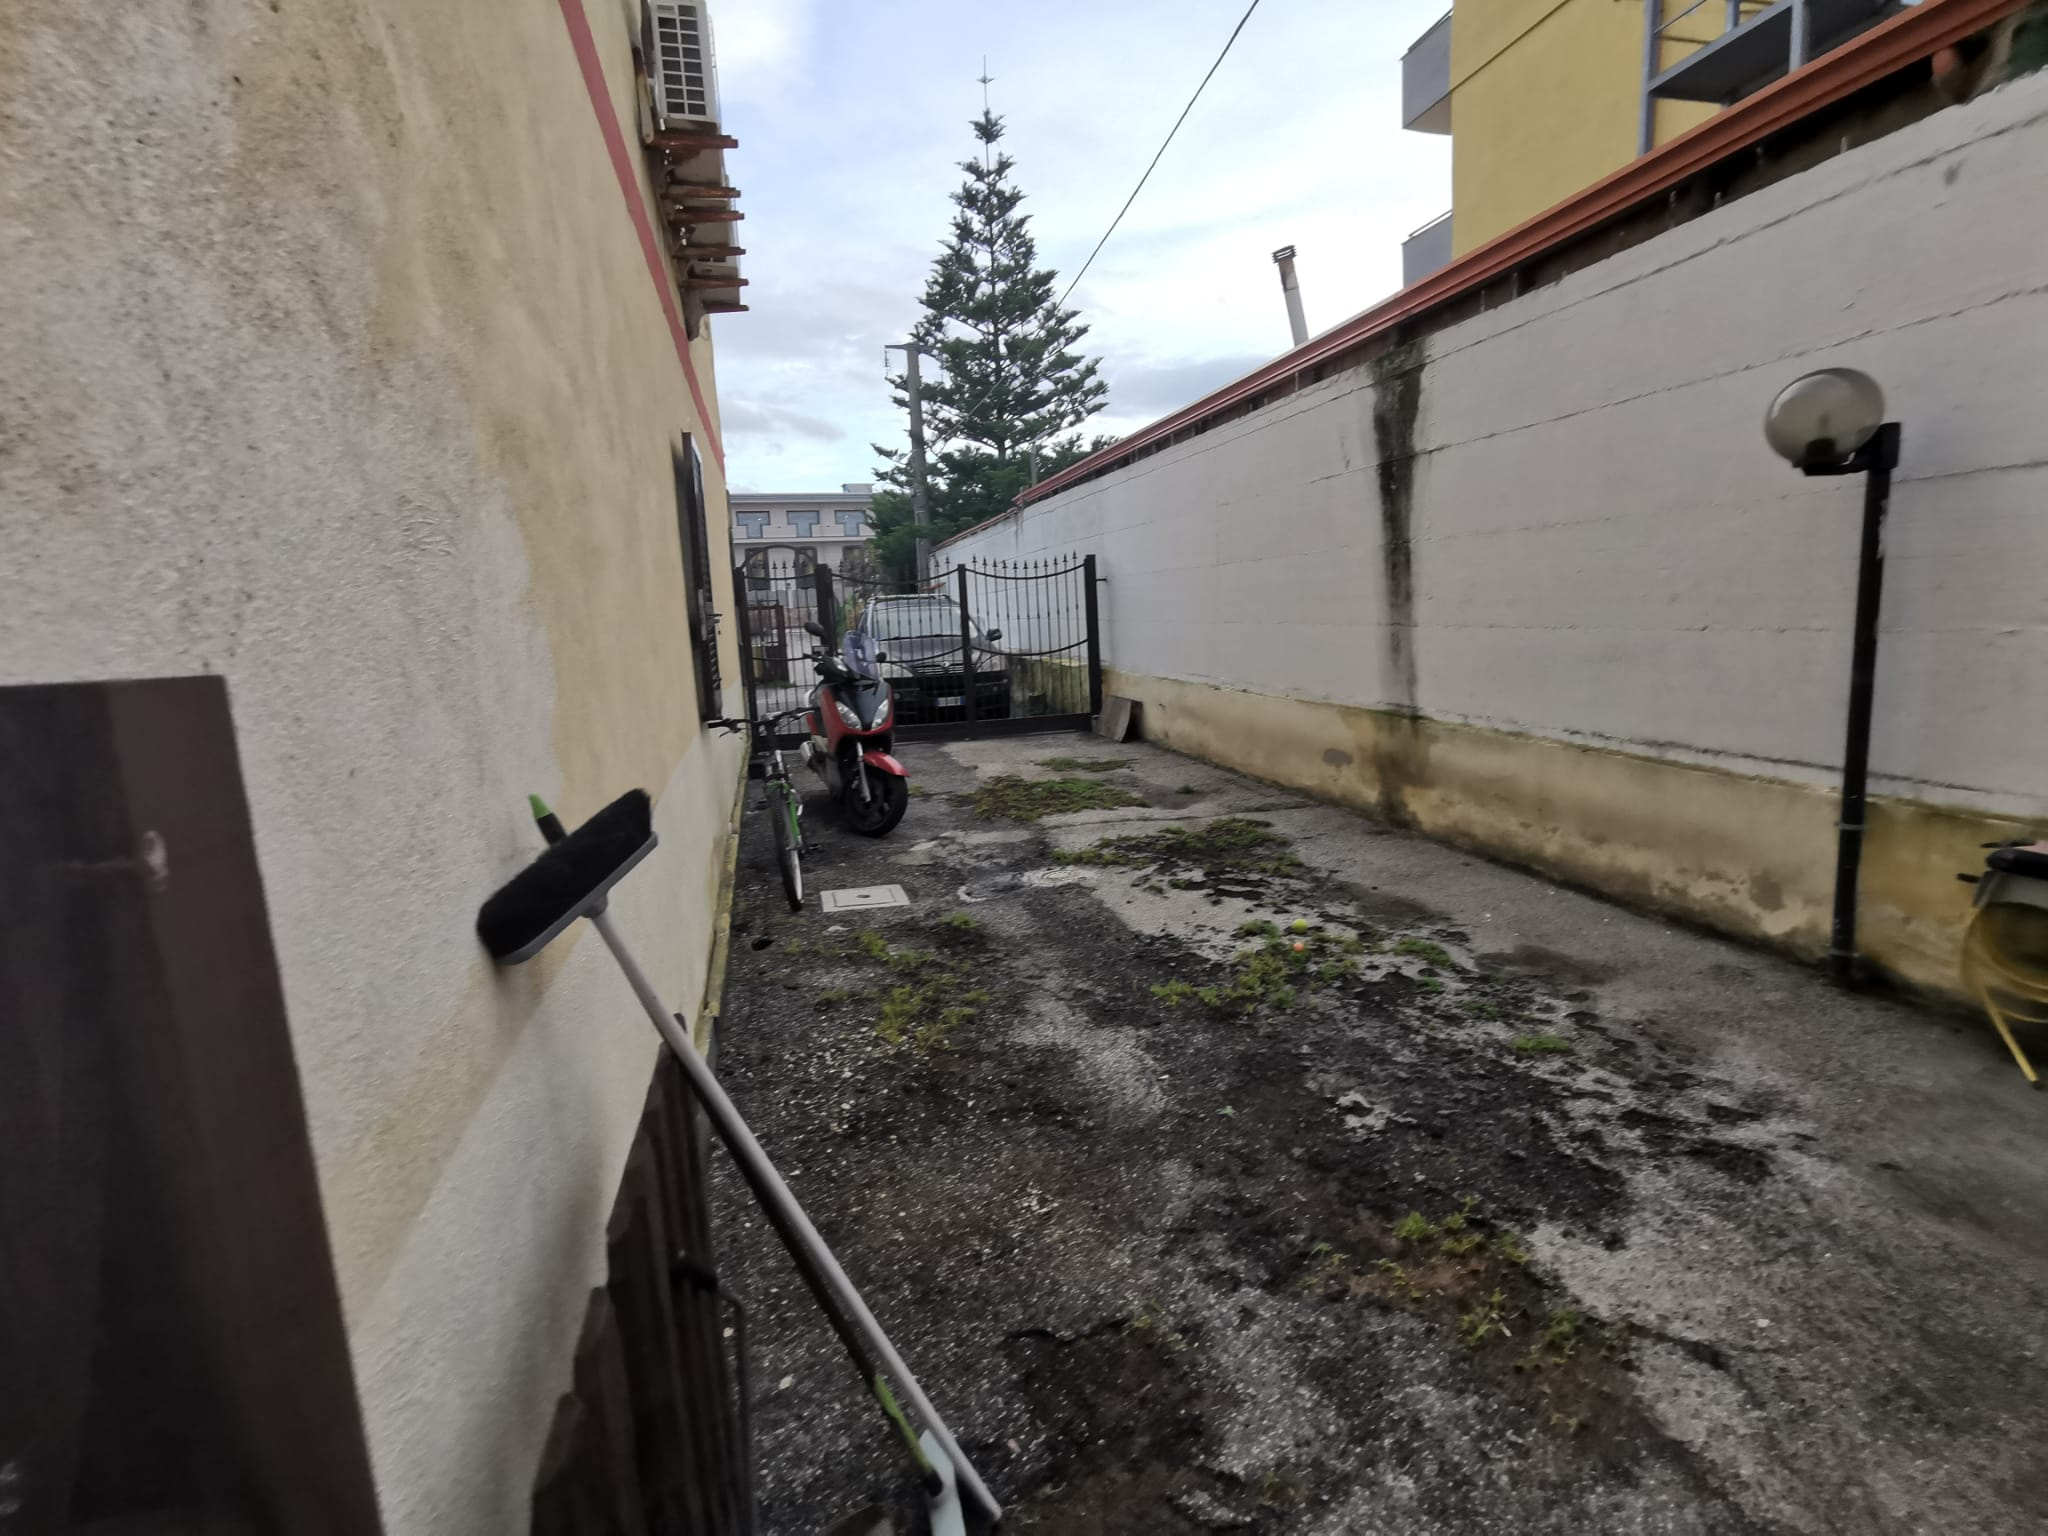 APPARTAMENTO CON GIARDINO IN PARCO Varcaturo Centro Rif 37202